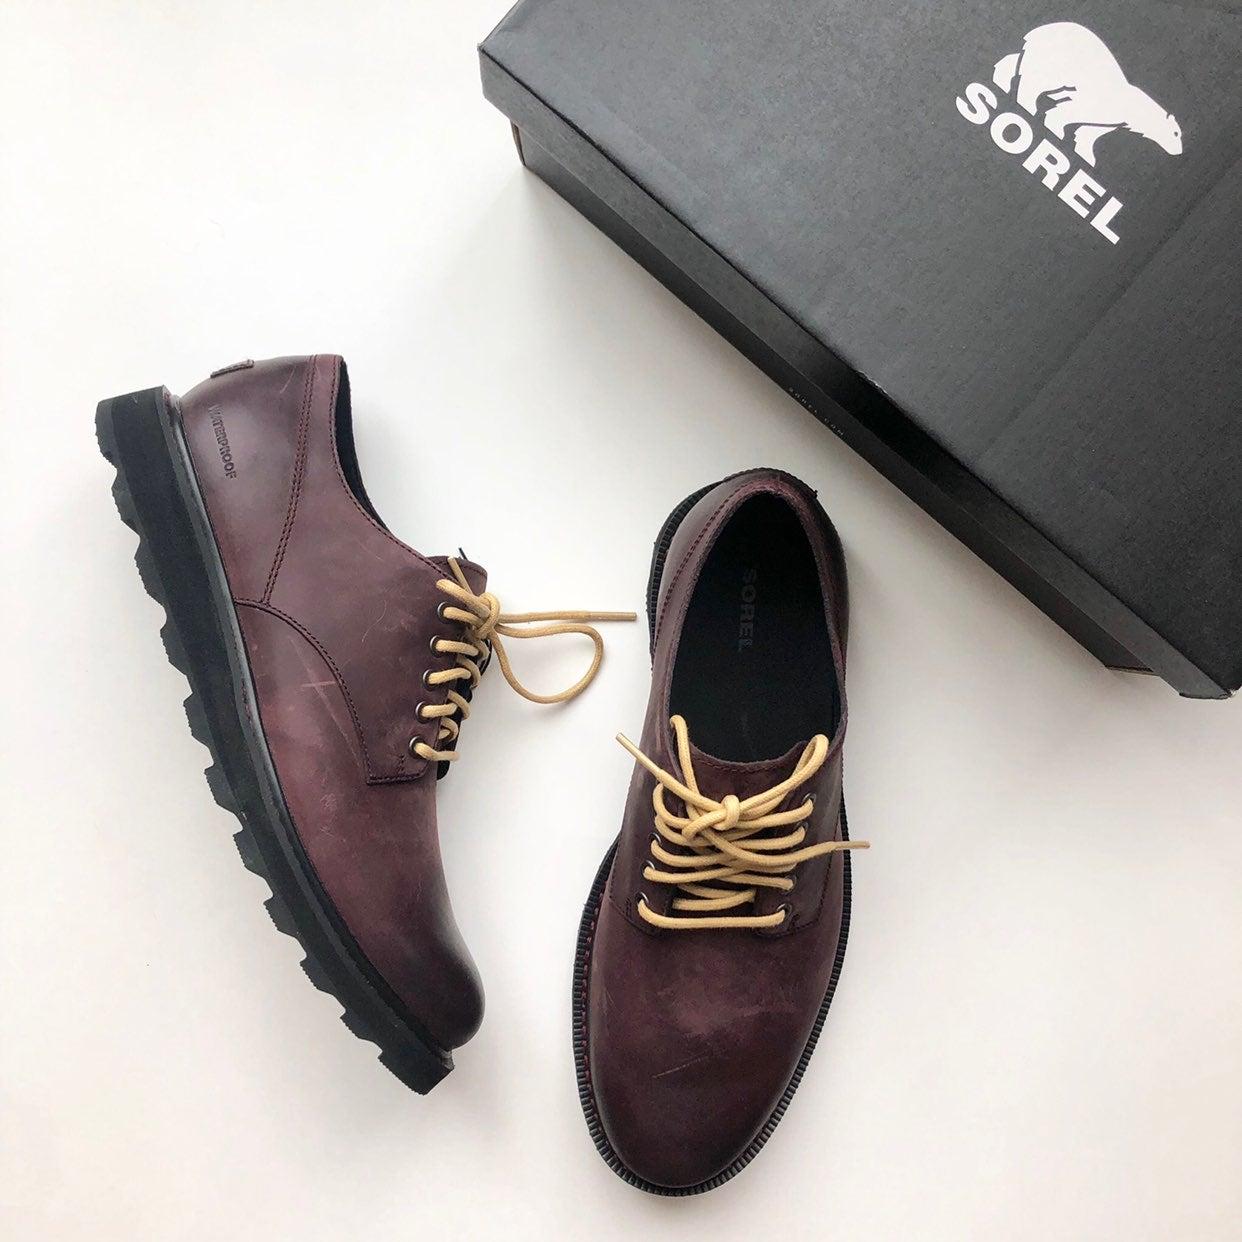 Sorel Madson Waterproof Leather Derby